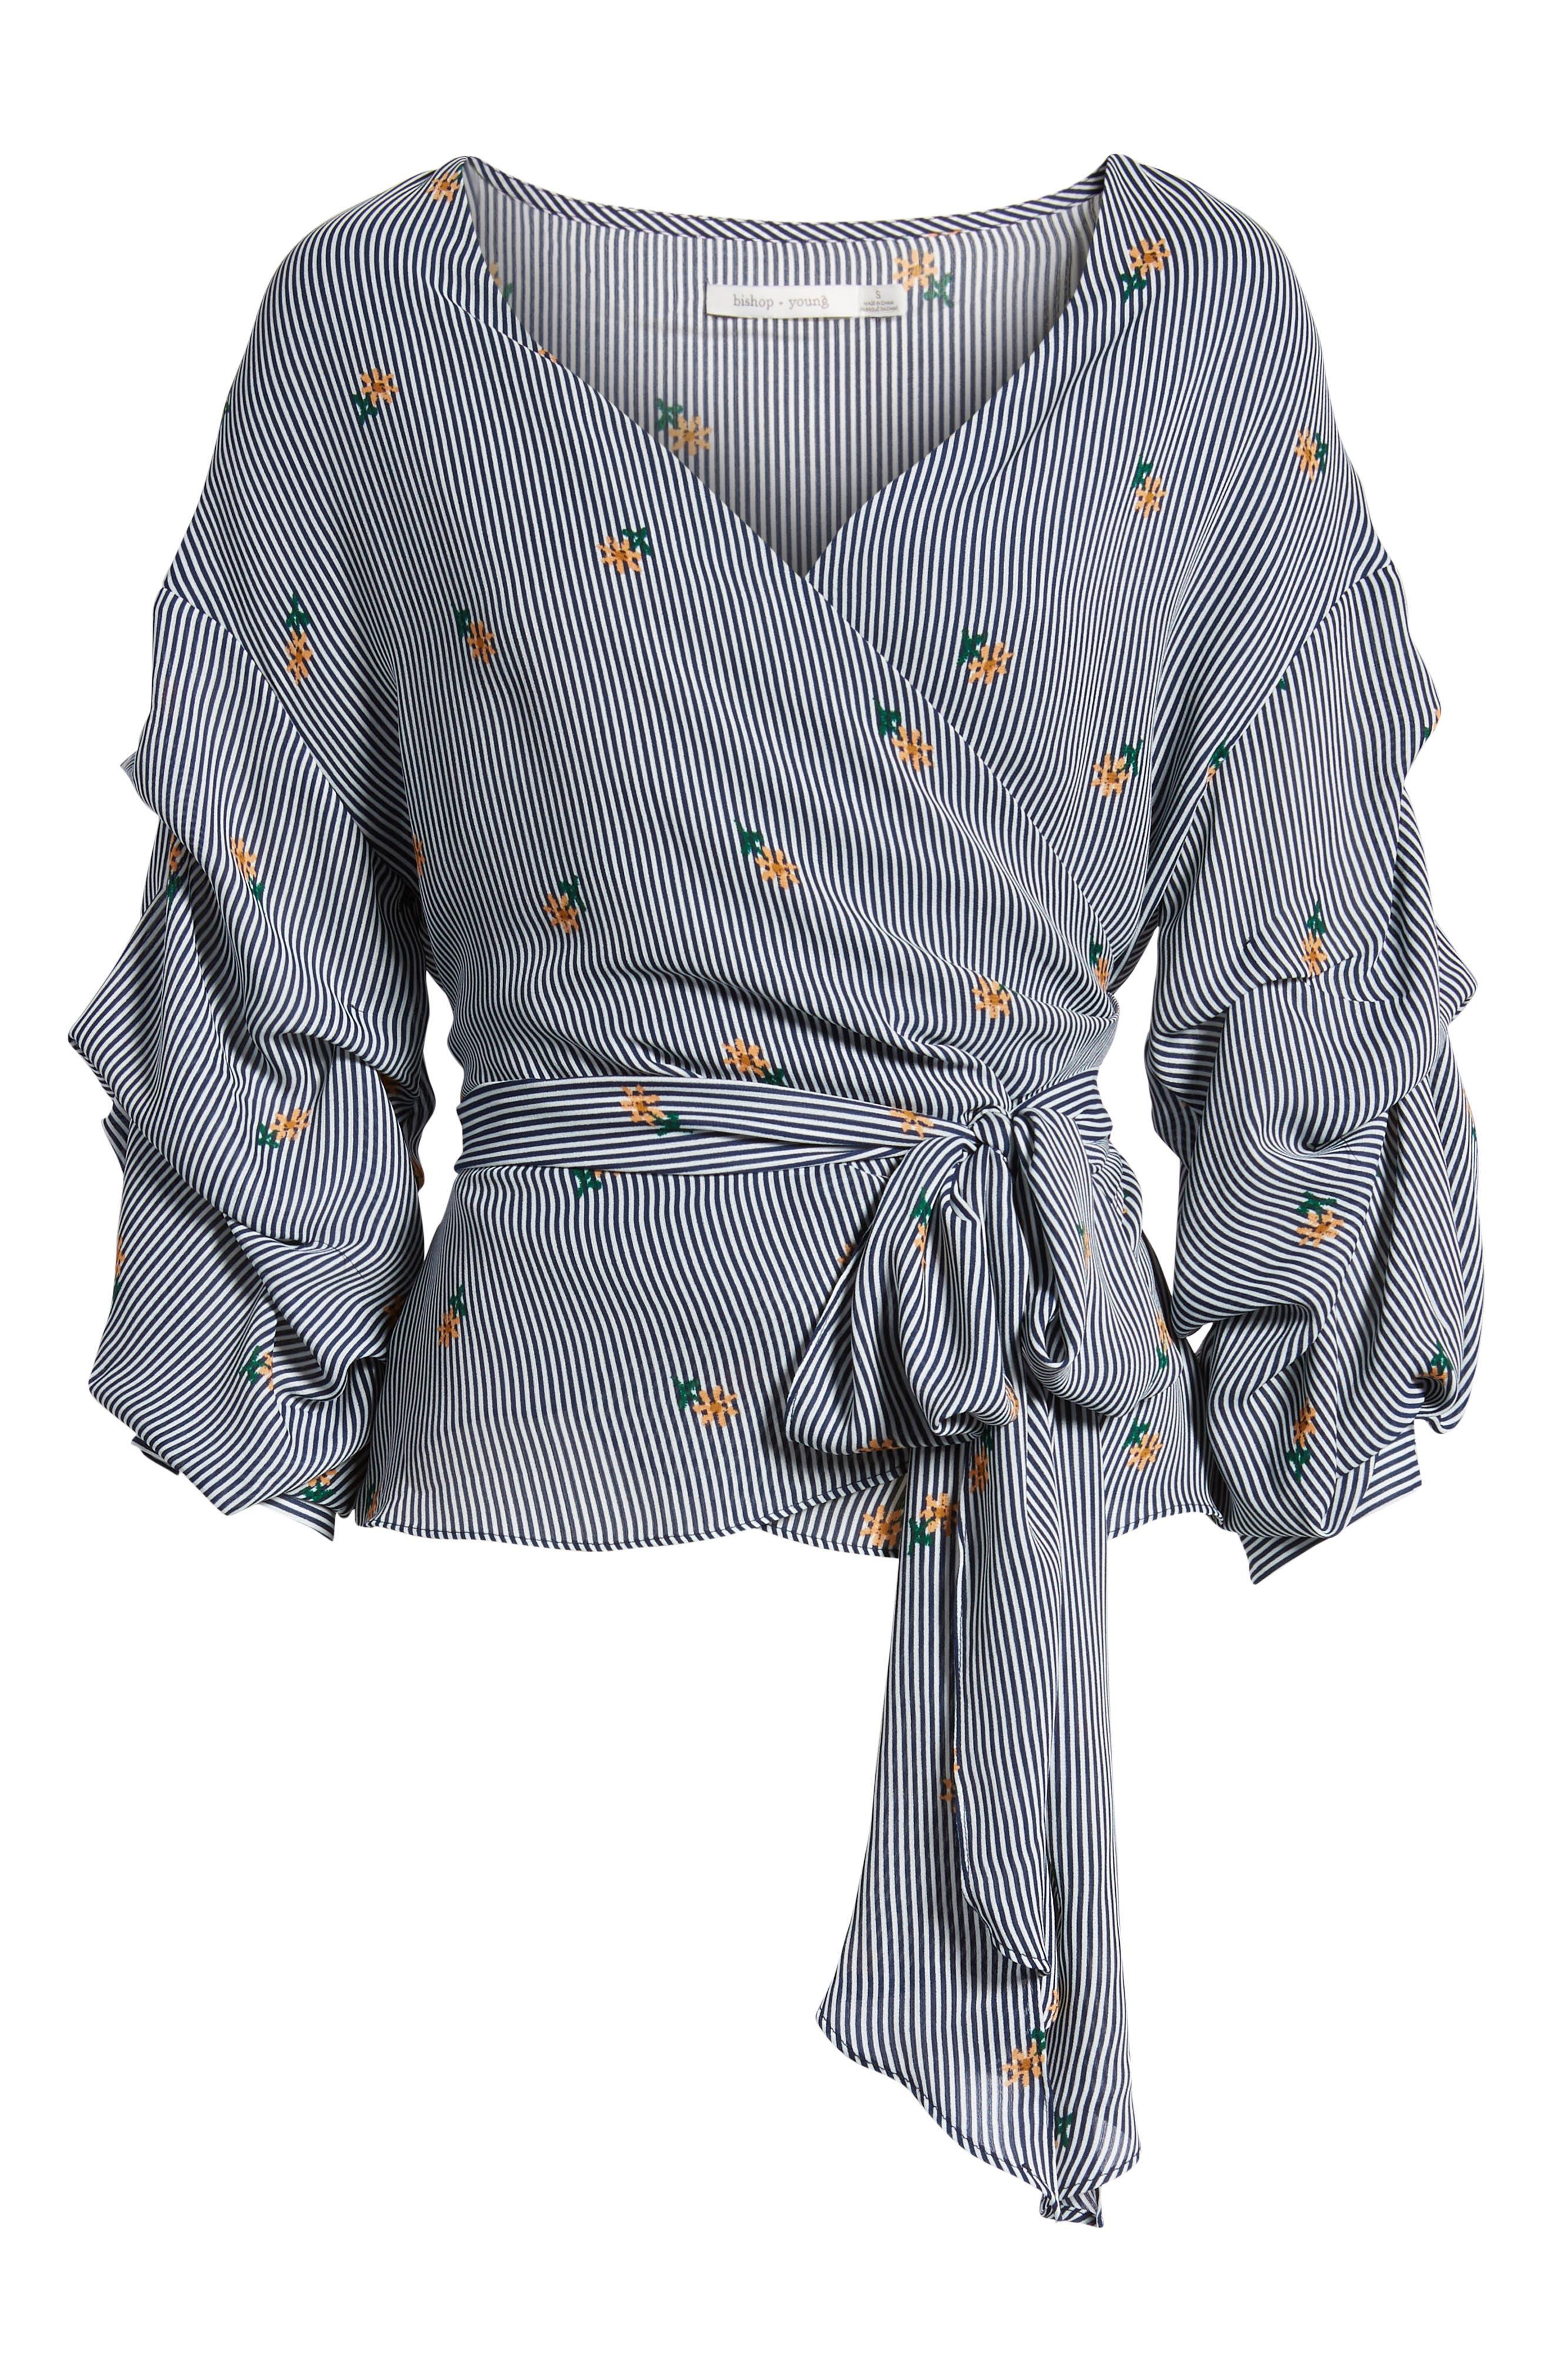 Bishop + Young Majorca Stripe Wrap Top,                             Alternate thumbnail 7, color,                             MAJORCA STRIPE